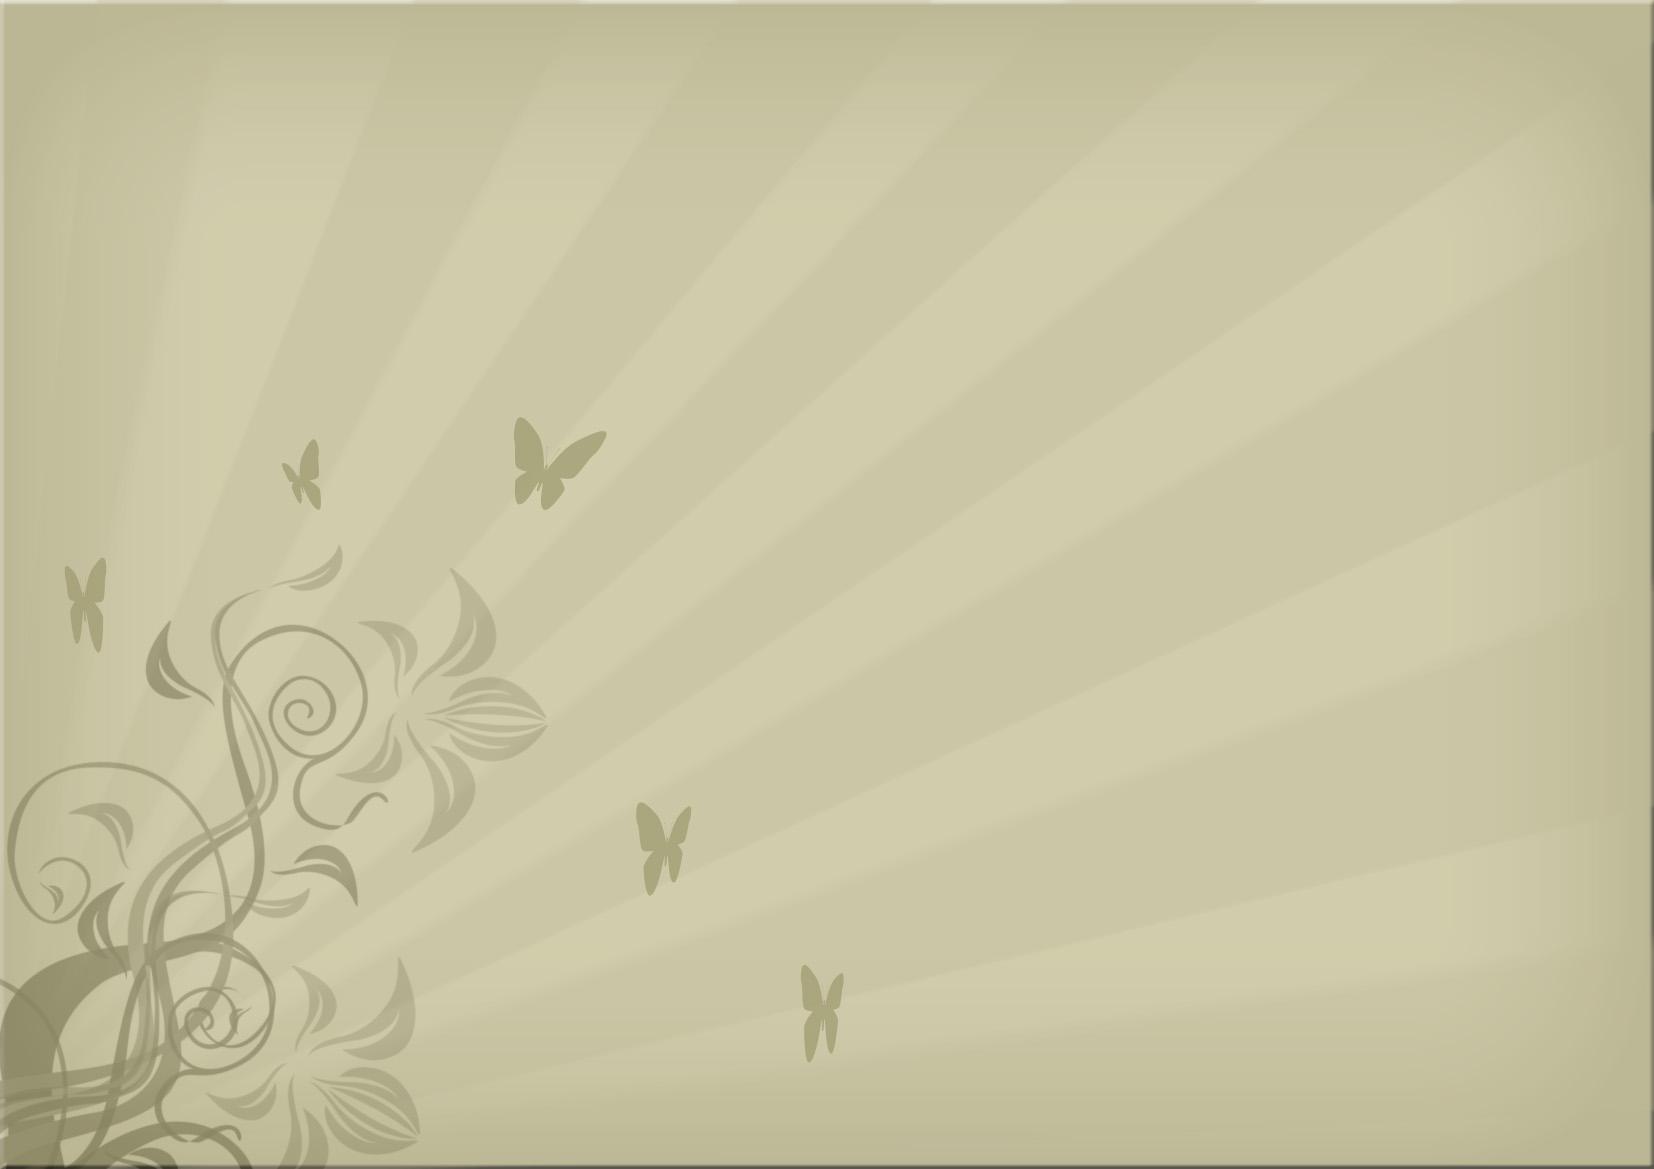 Wedding Background Design Vector